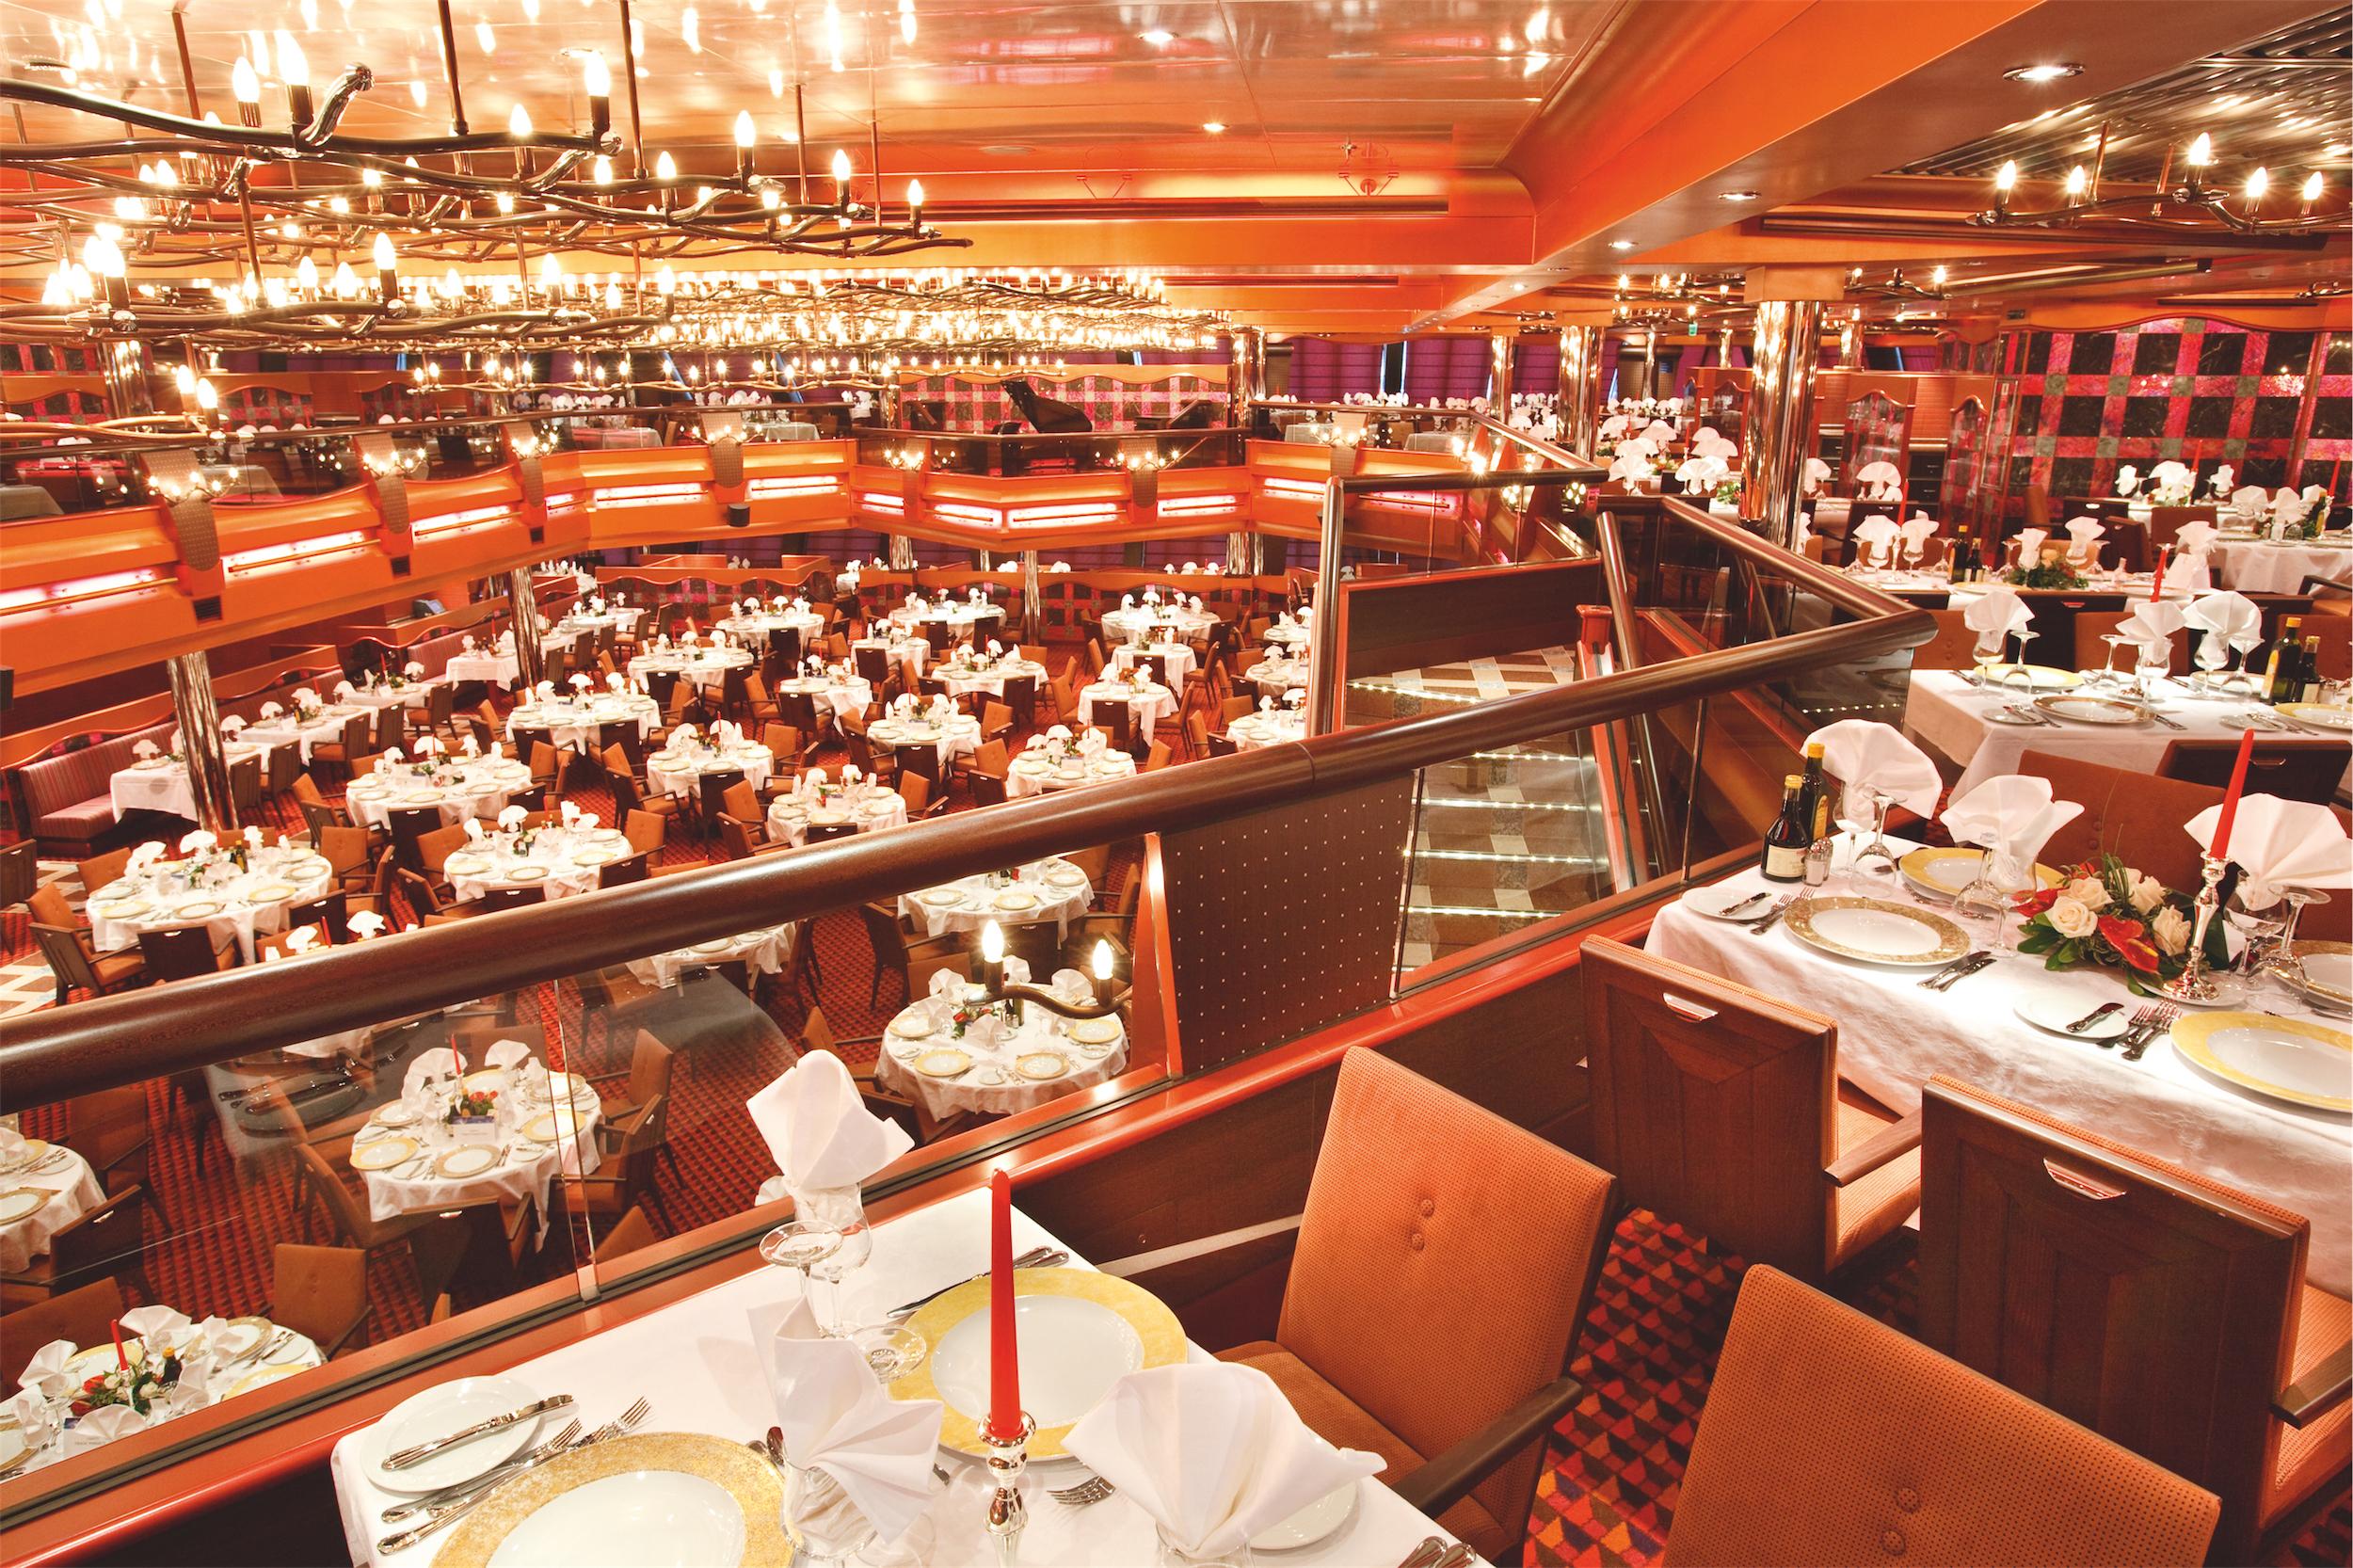 Costa Cruises Costa Pacifica Interior New York New York Restaurant.JPG